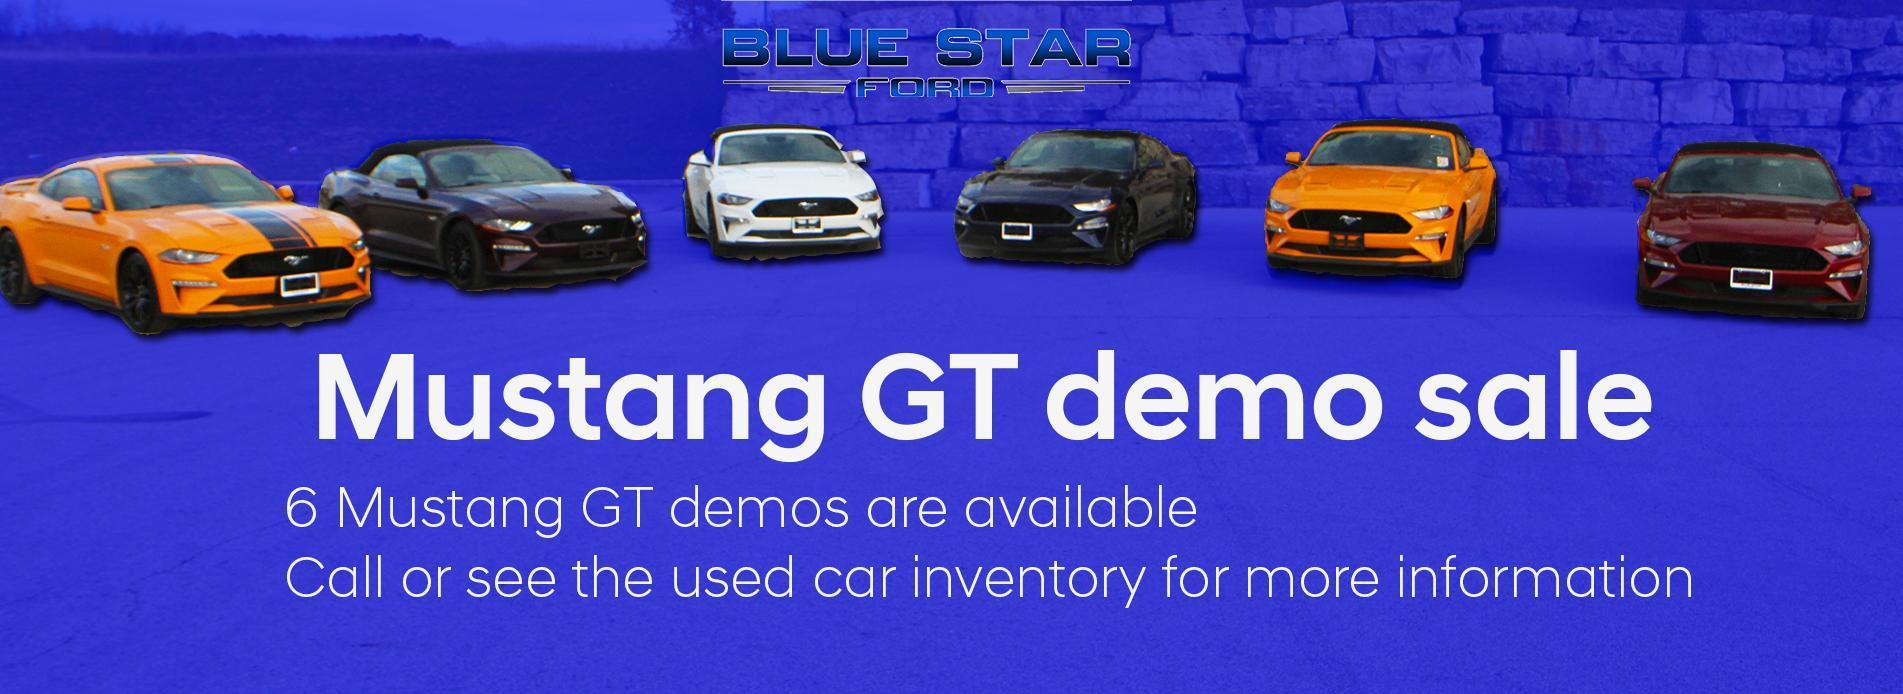 Mustang demo sale